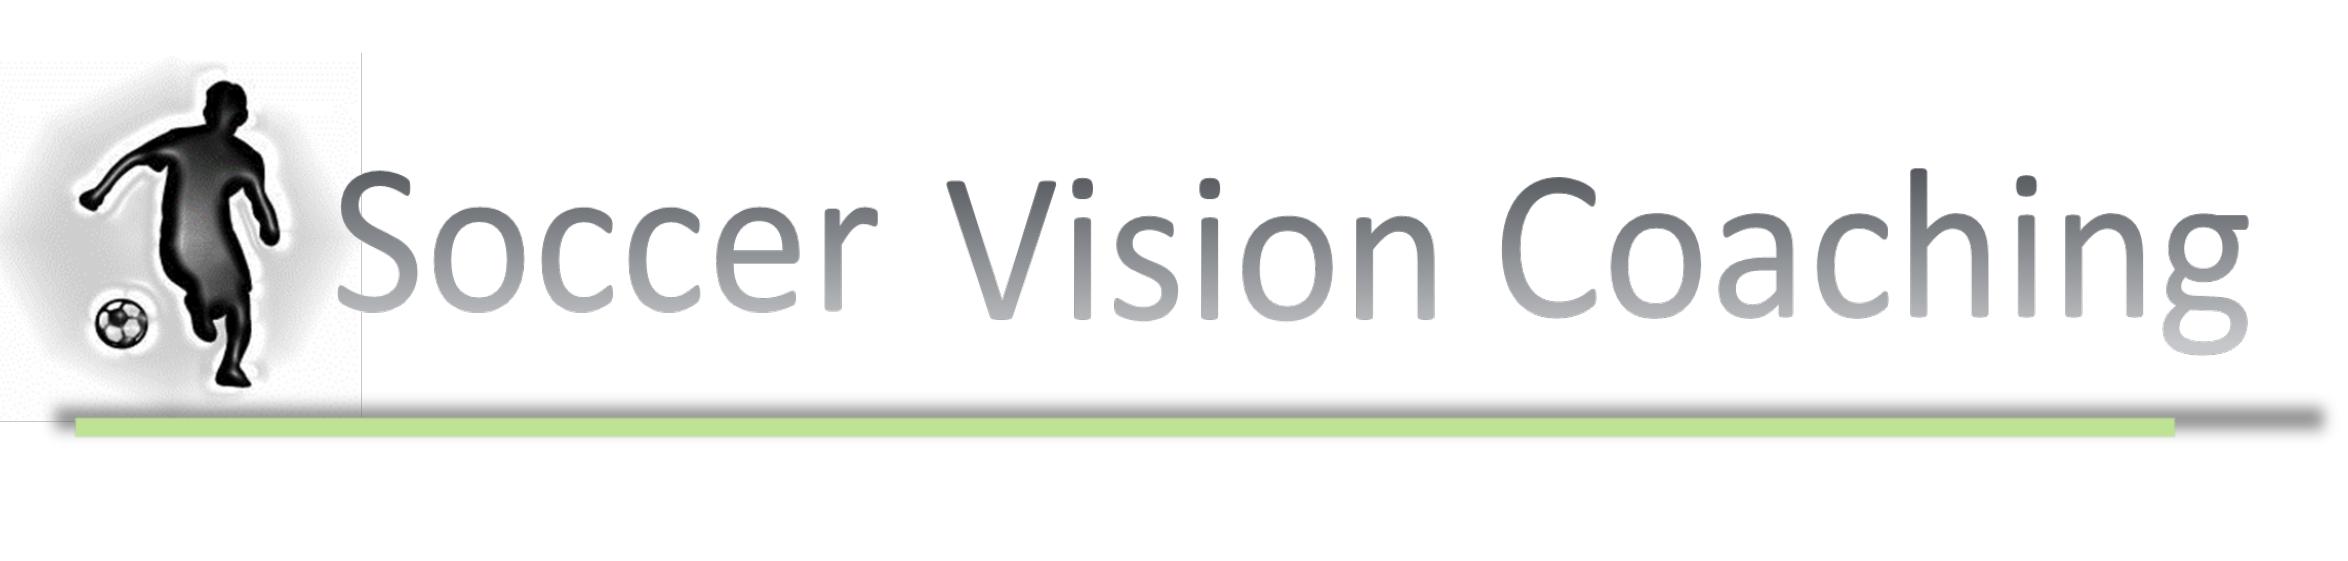 Soccer Vision Coaching(サッカービジョンコーチング)